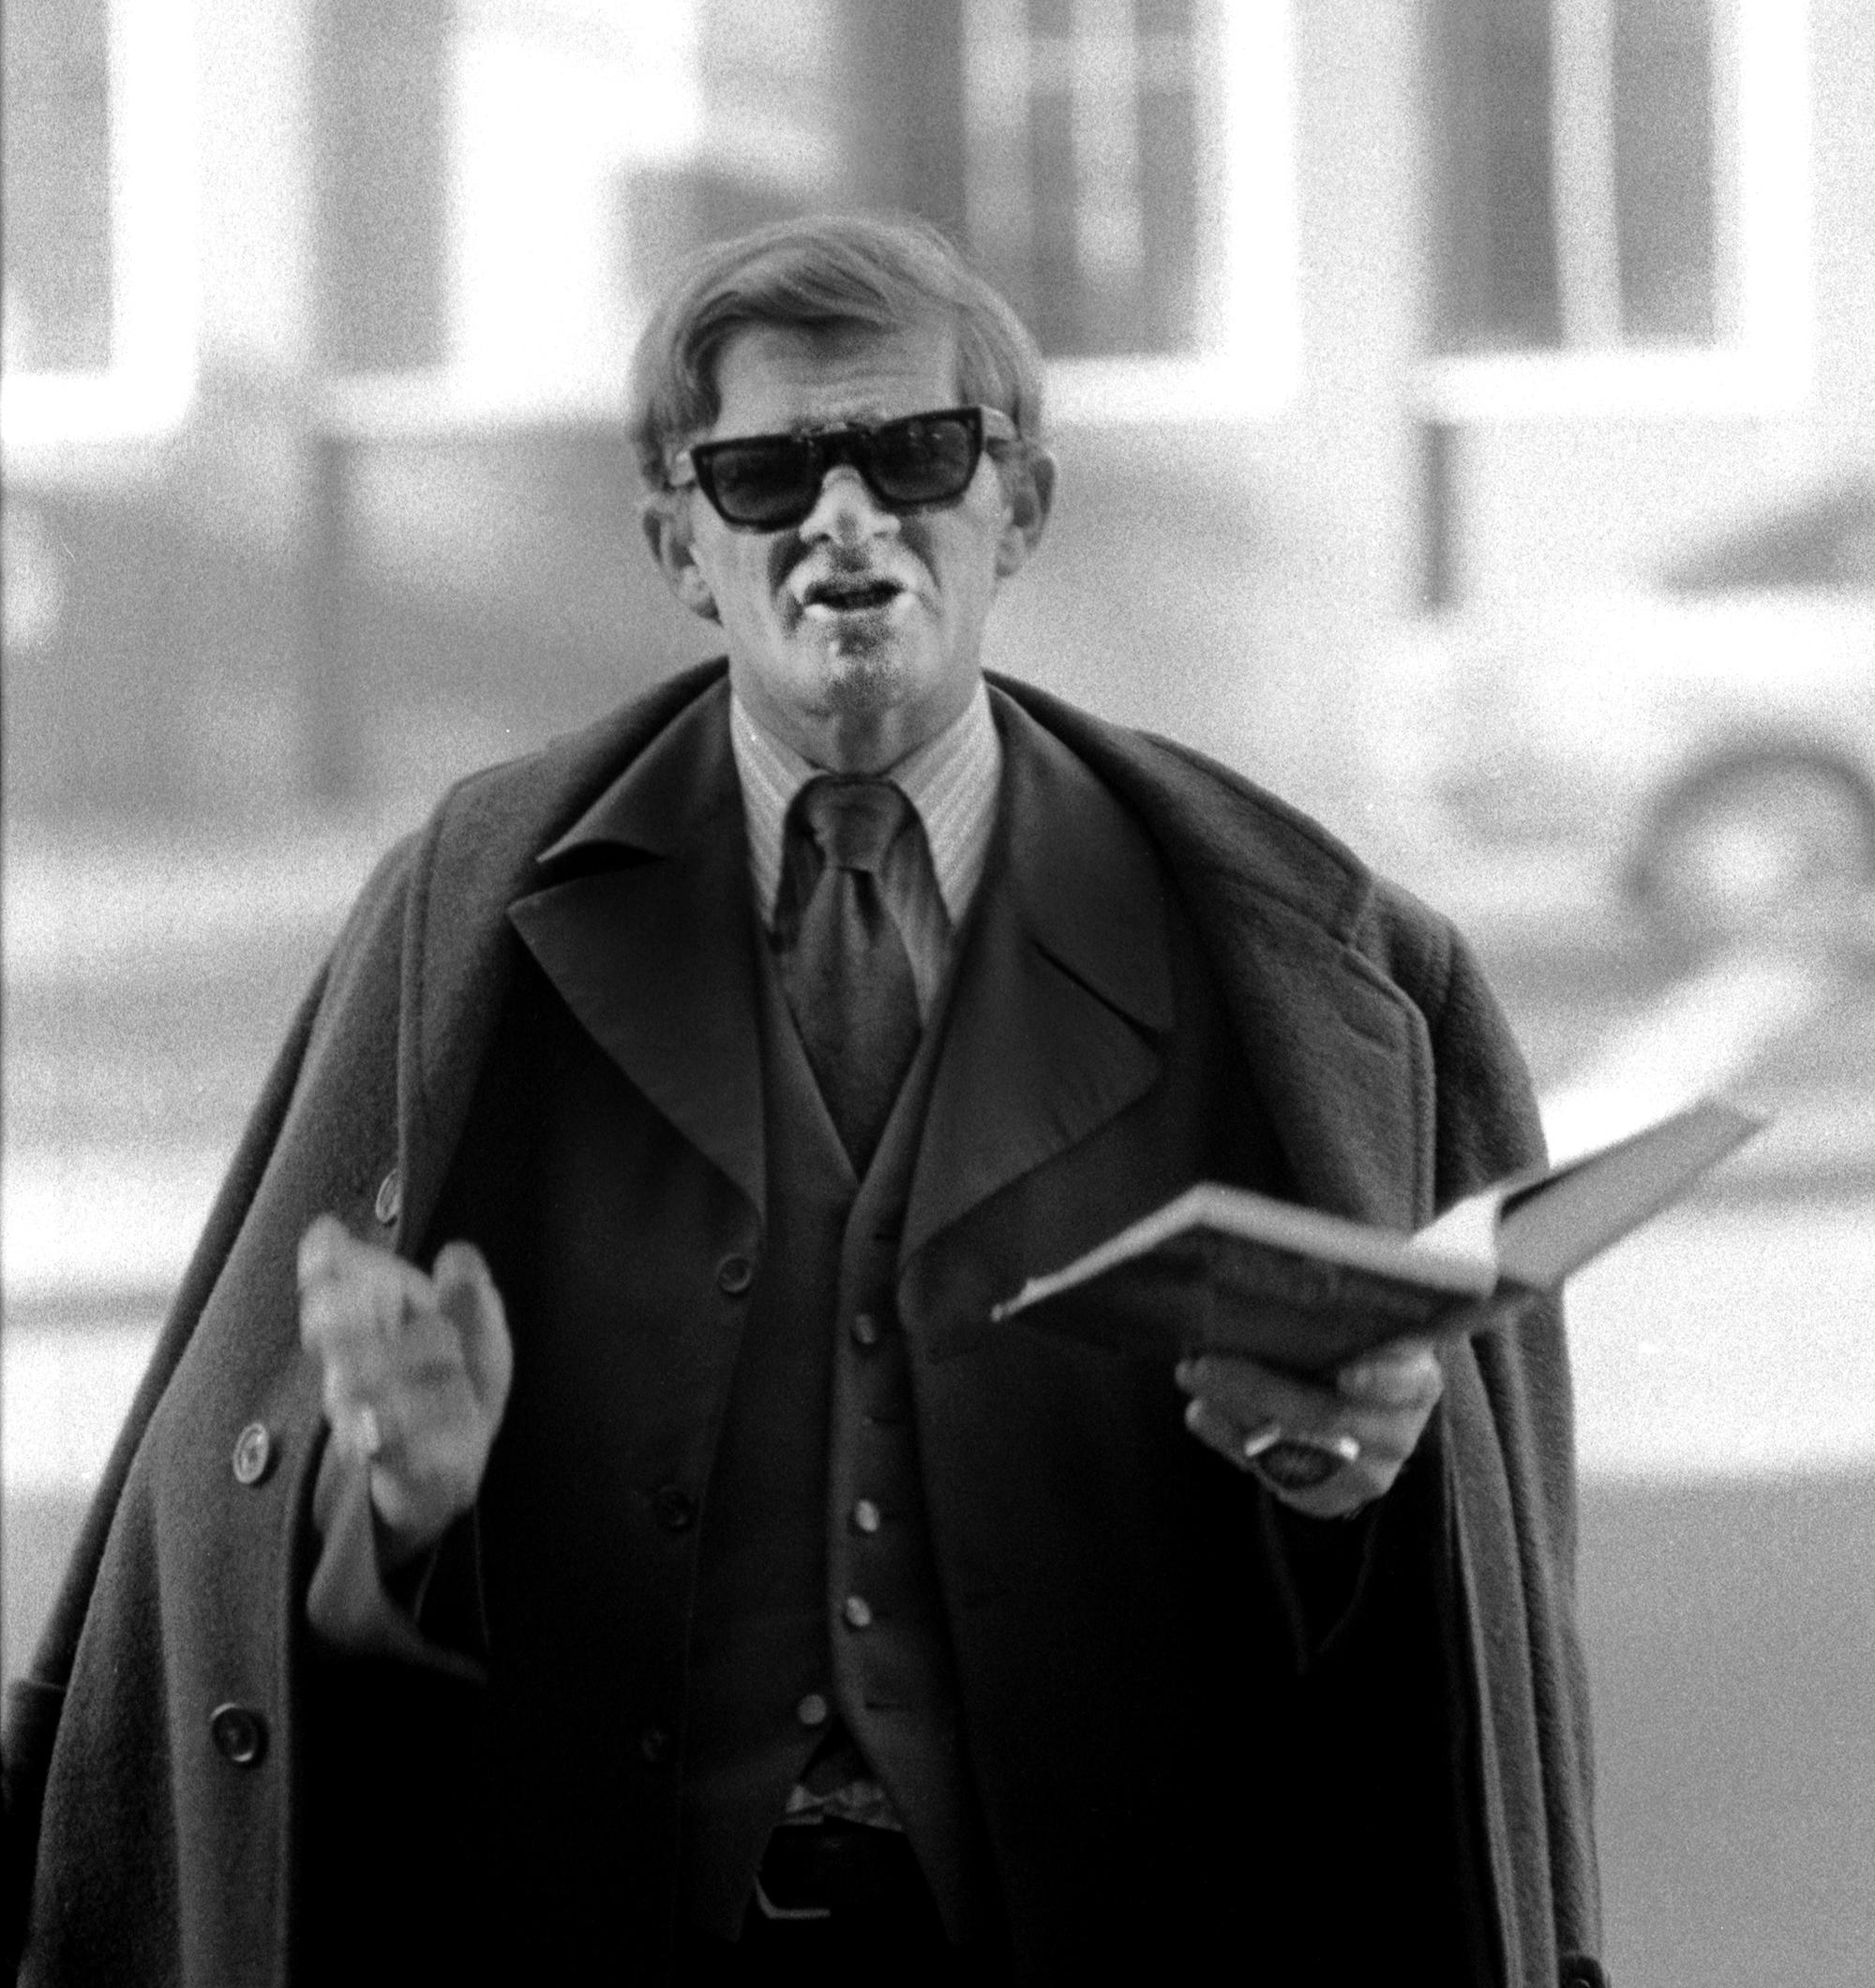 STREET PREACHER / MELBOURNE 1978